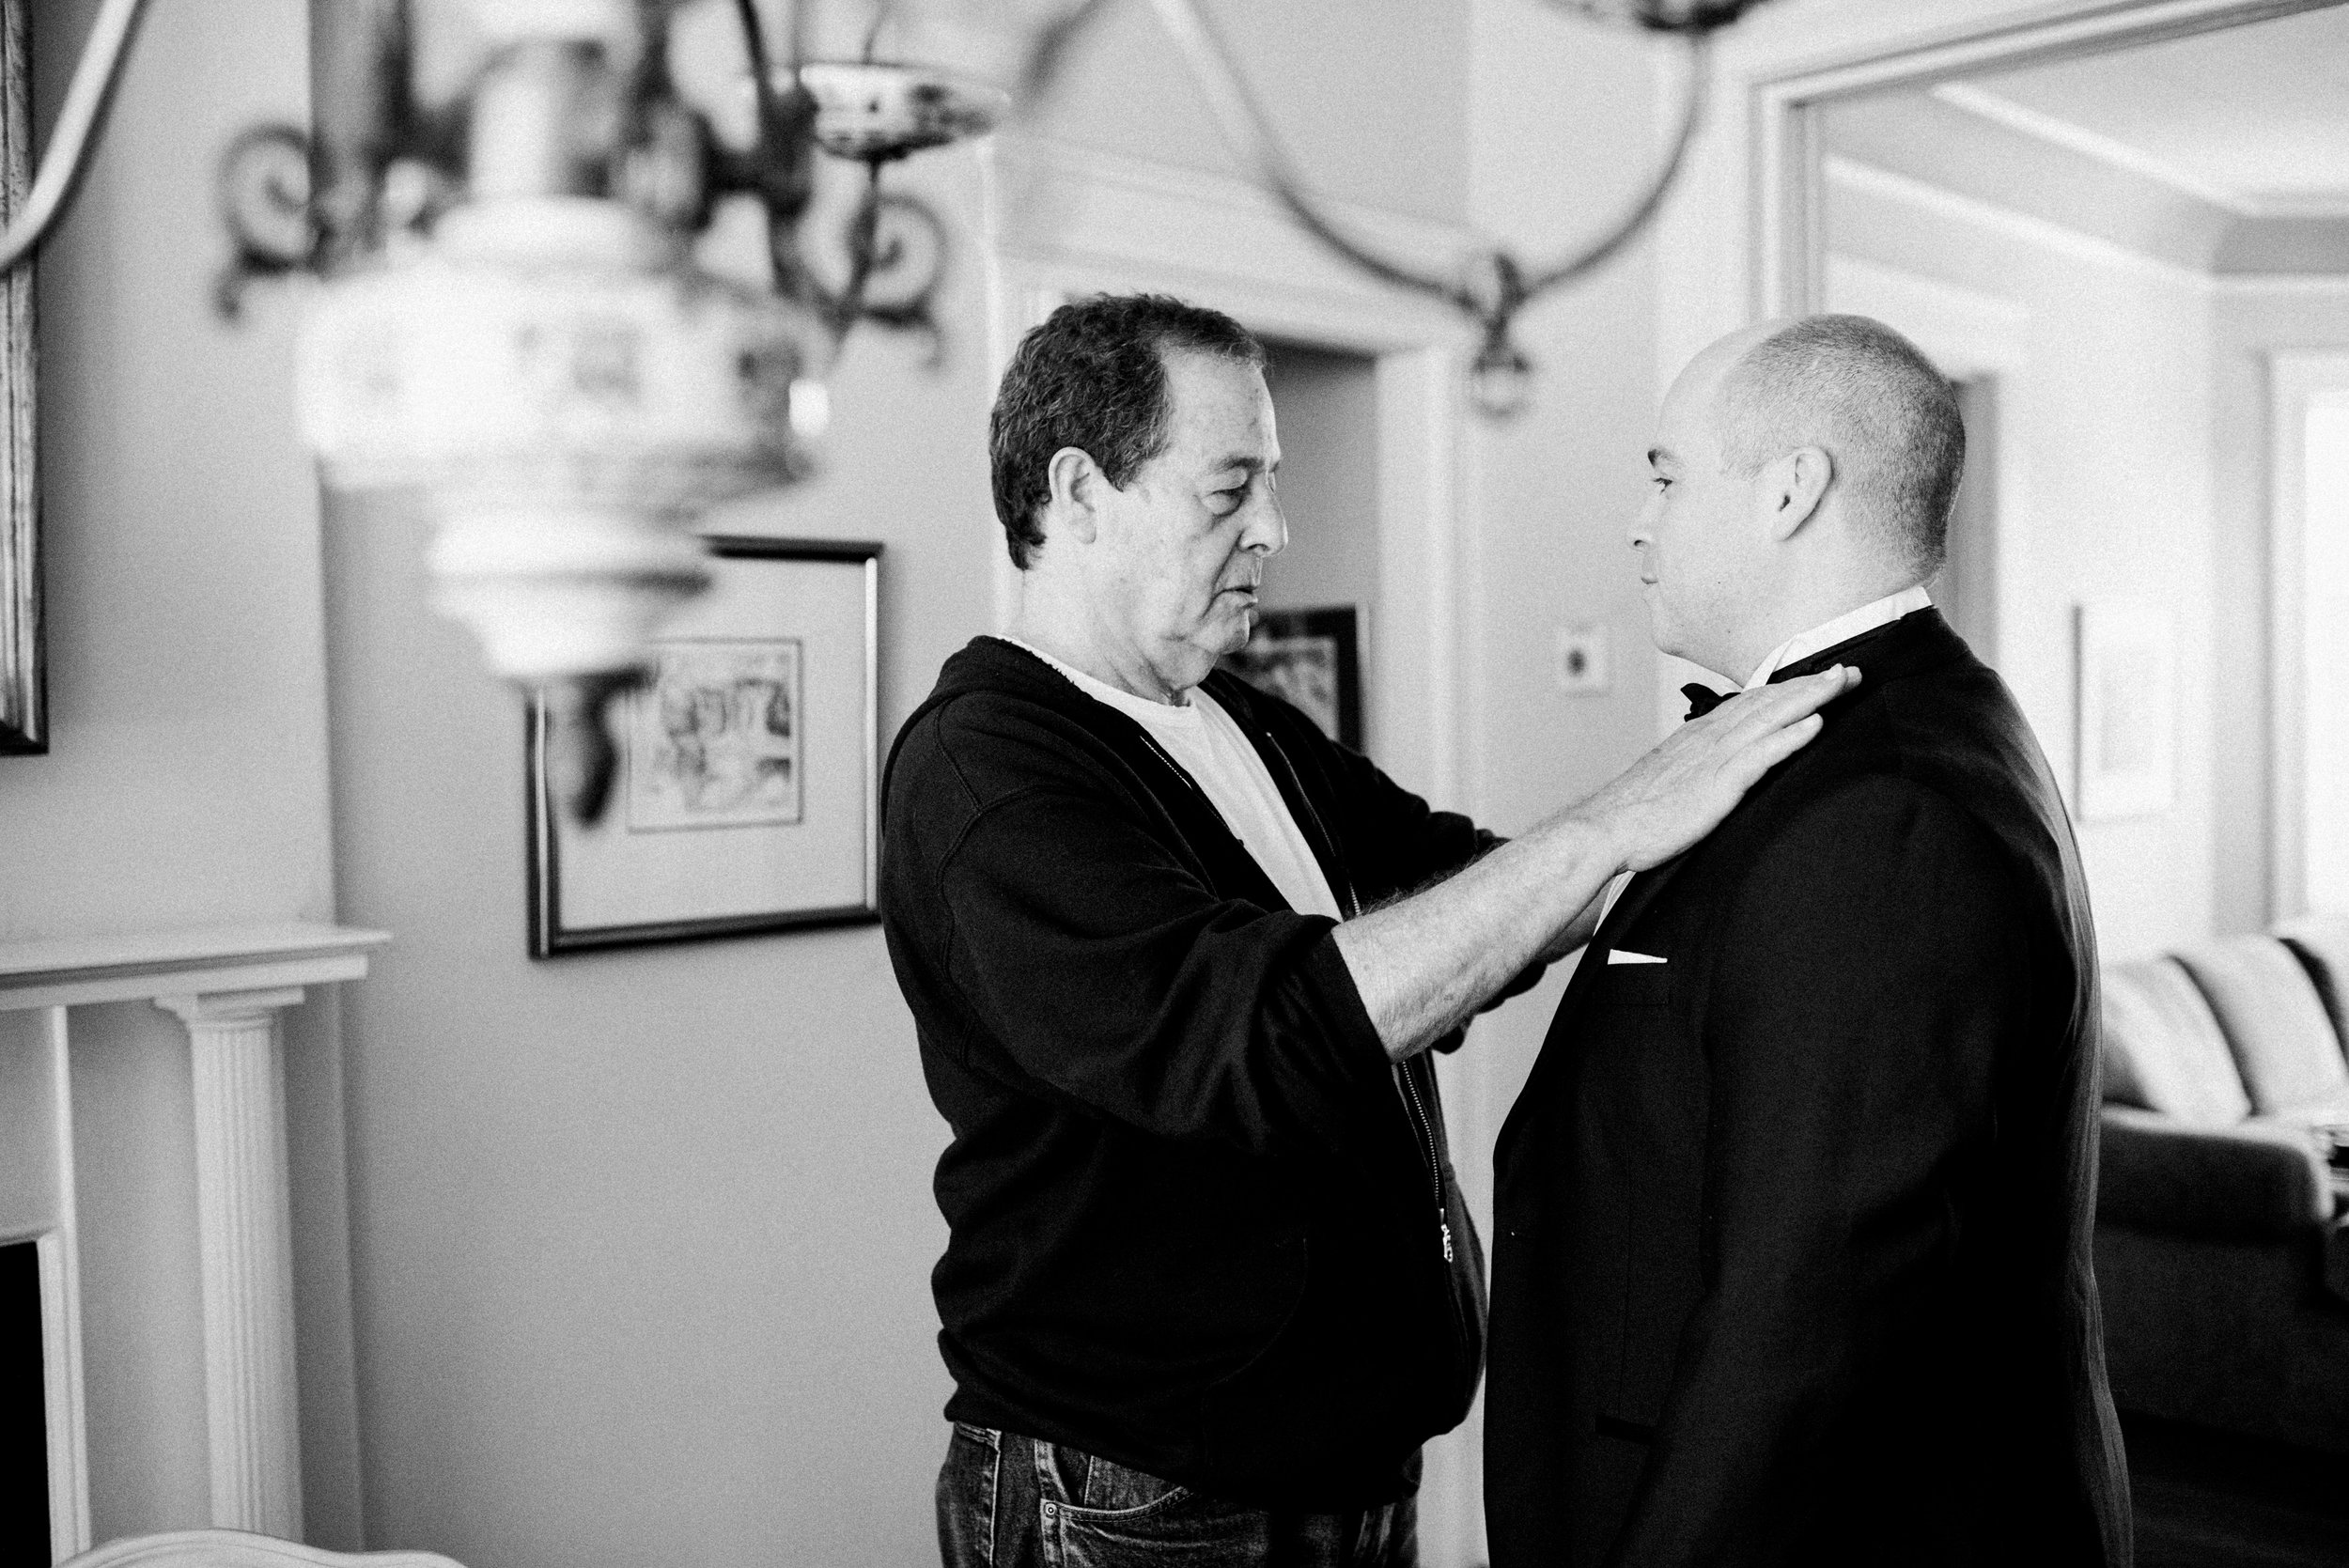 Swedenborgian Church Dogpatch Winery Wedding010.jpg